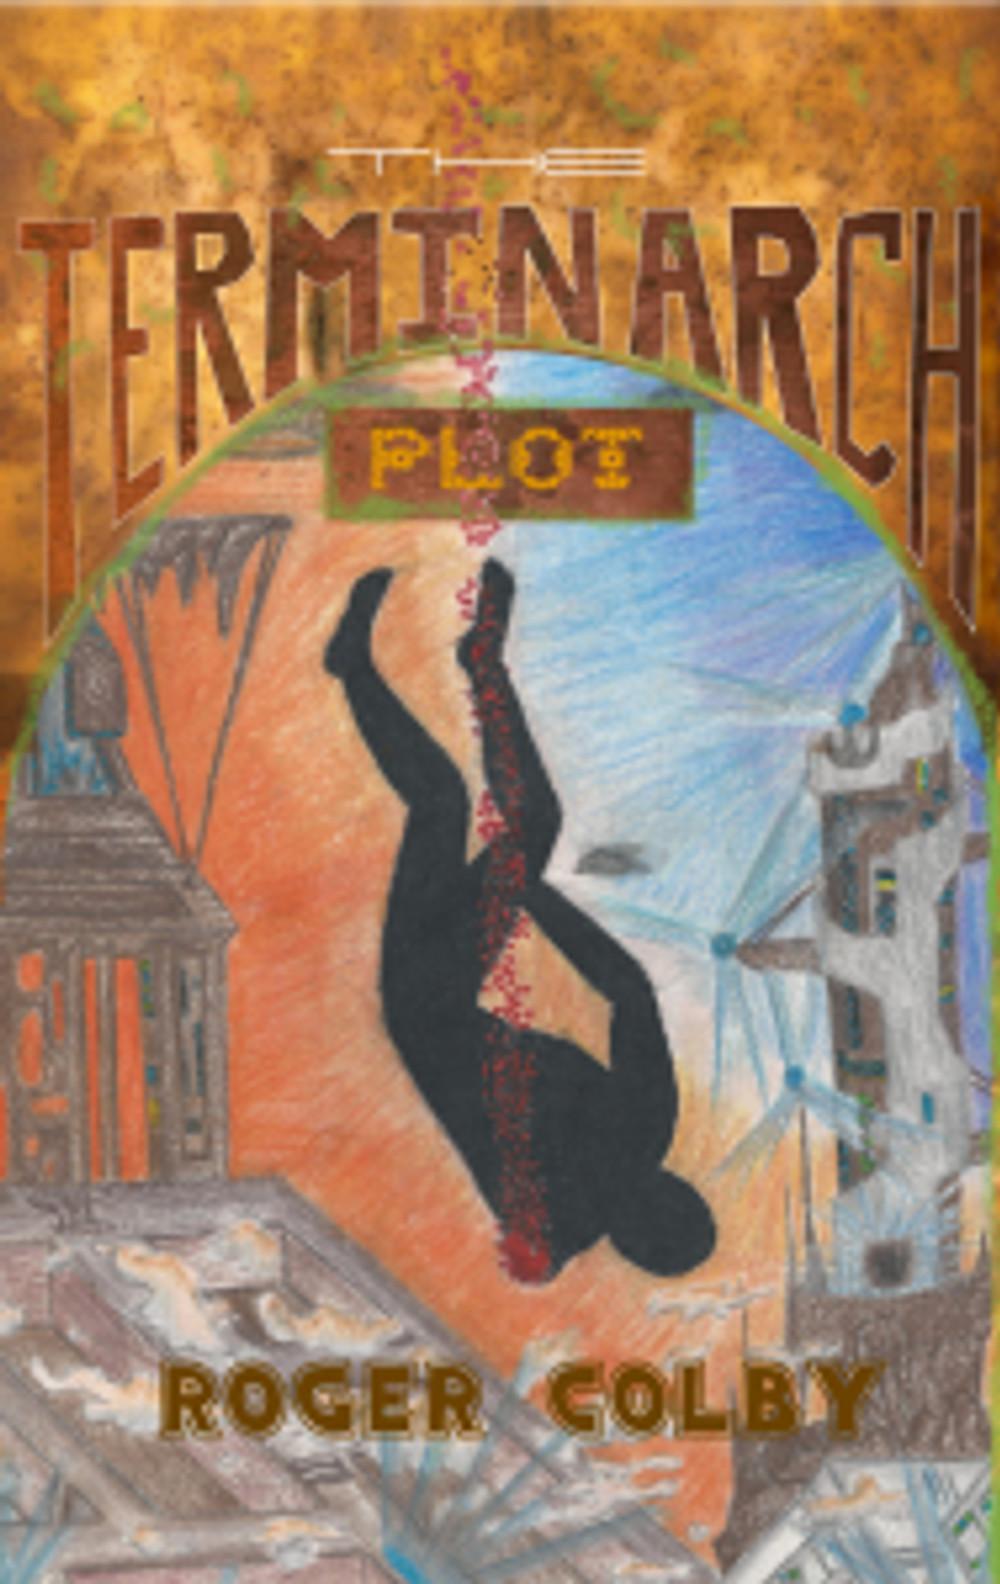 terminarch plot cover reveal